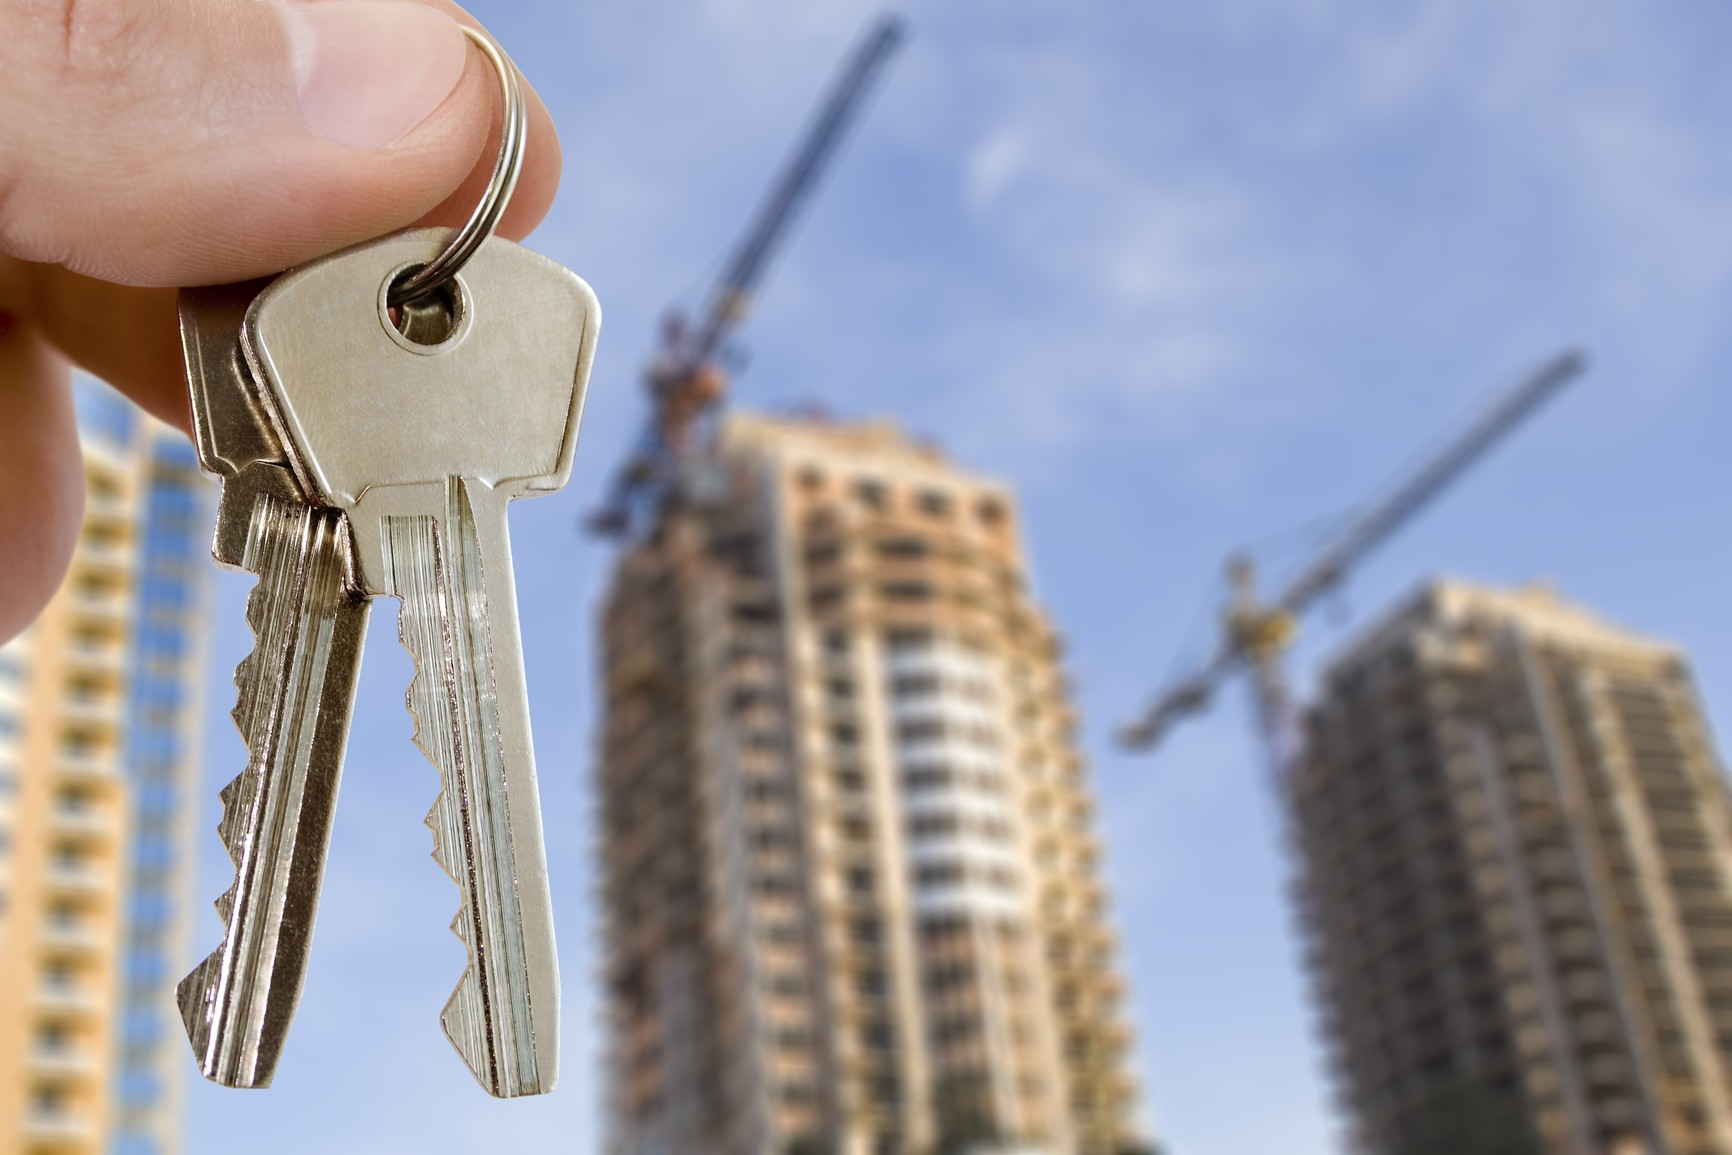 Медведев одобрил план наращивания ипотечного кредитования до 2020